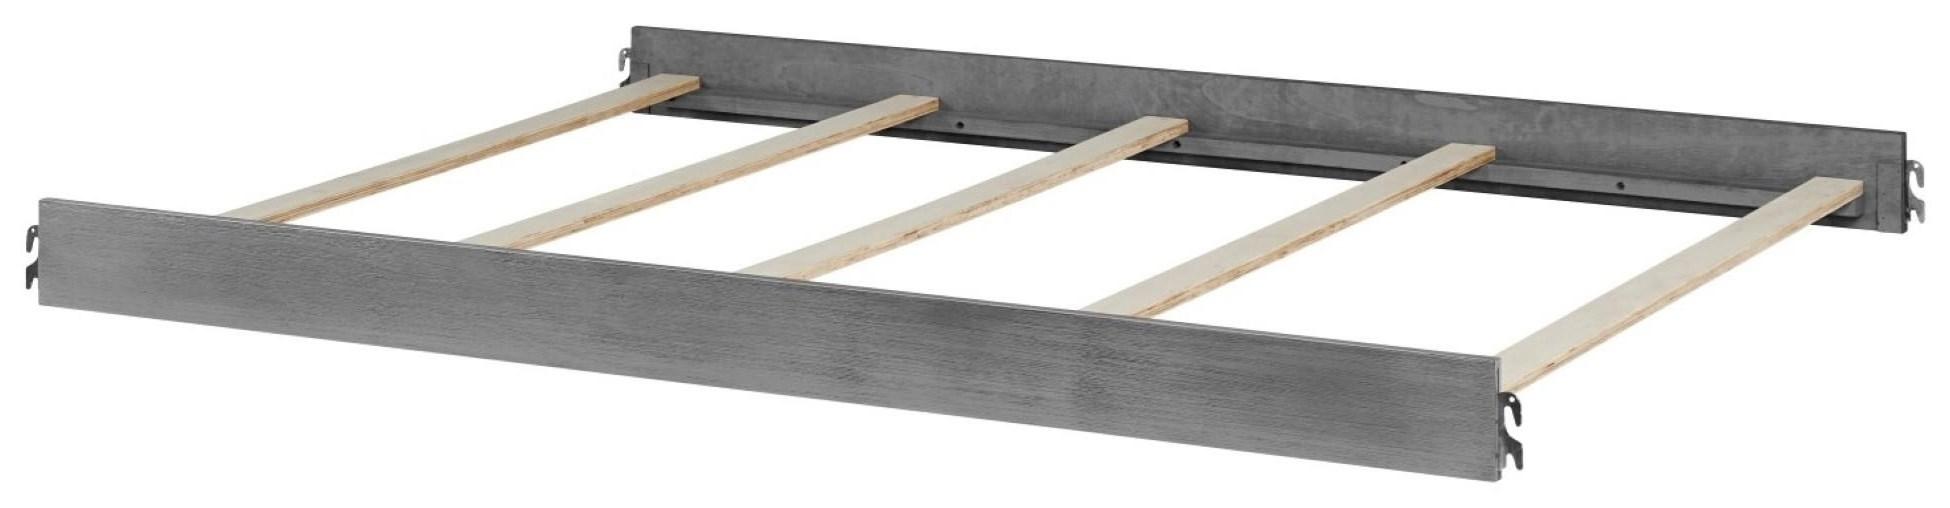 Gray Full Bed Conversion Kit